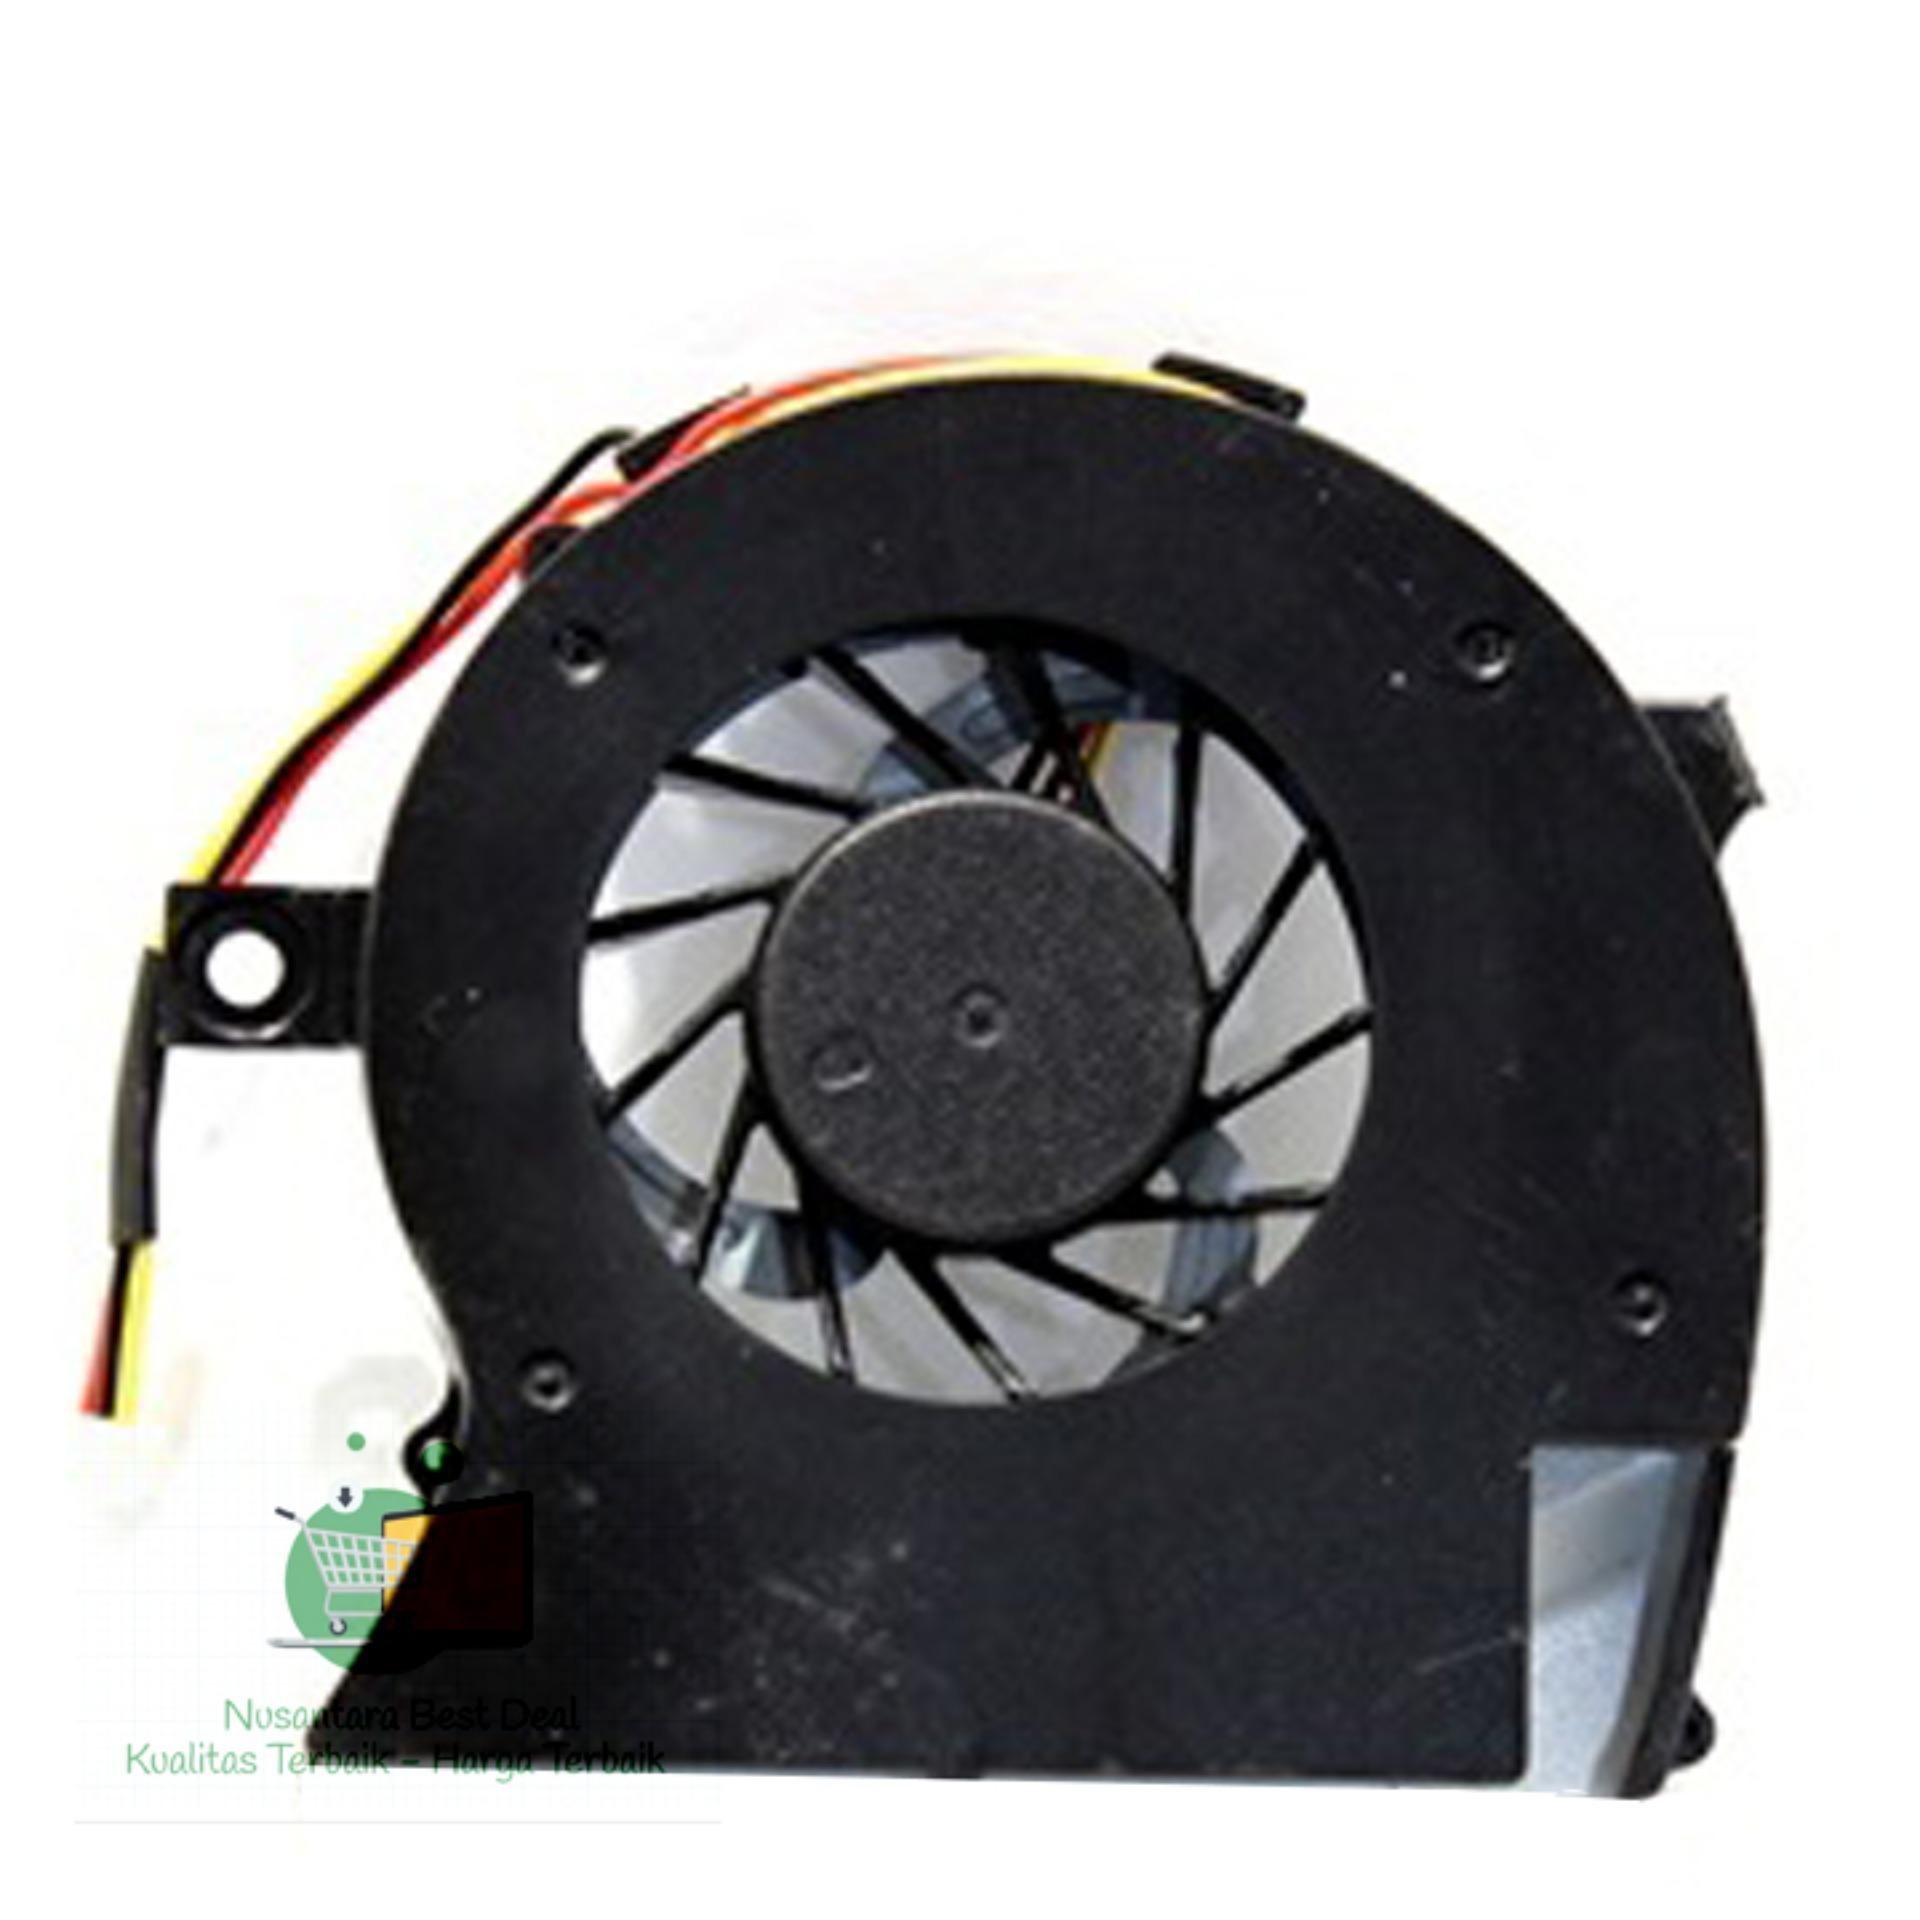 Features Fan Laptop Toshiba Satellite L740 L745 Dan Harga Terbaru Lcd Led C600 C640 L600 L640 L645 Detail Gambar